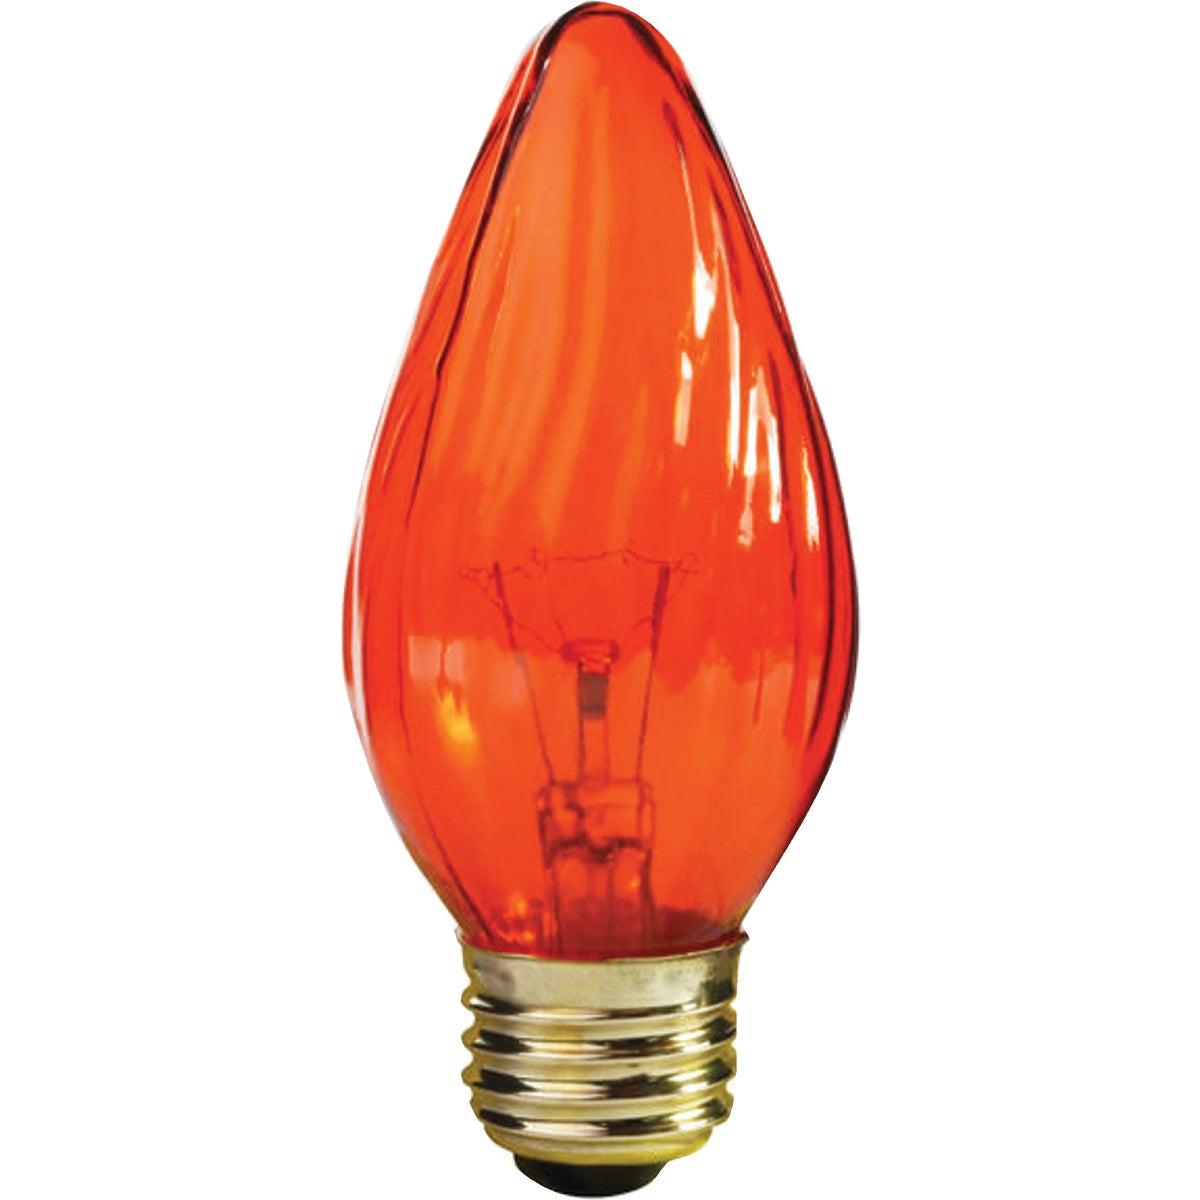 25W AMBER FLAME TIP BULB - 75339 by G E Lighting